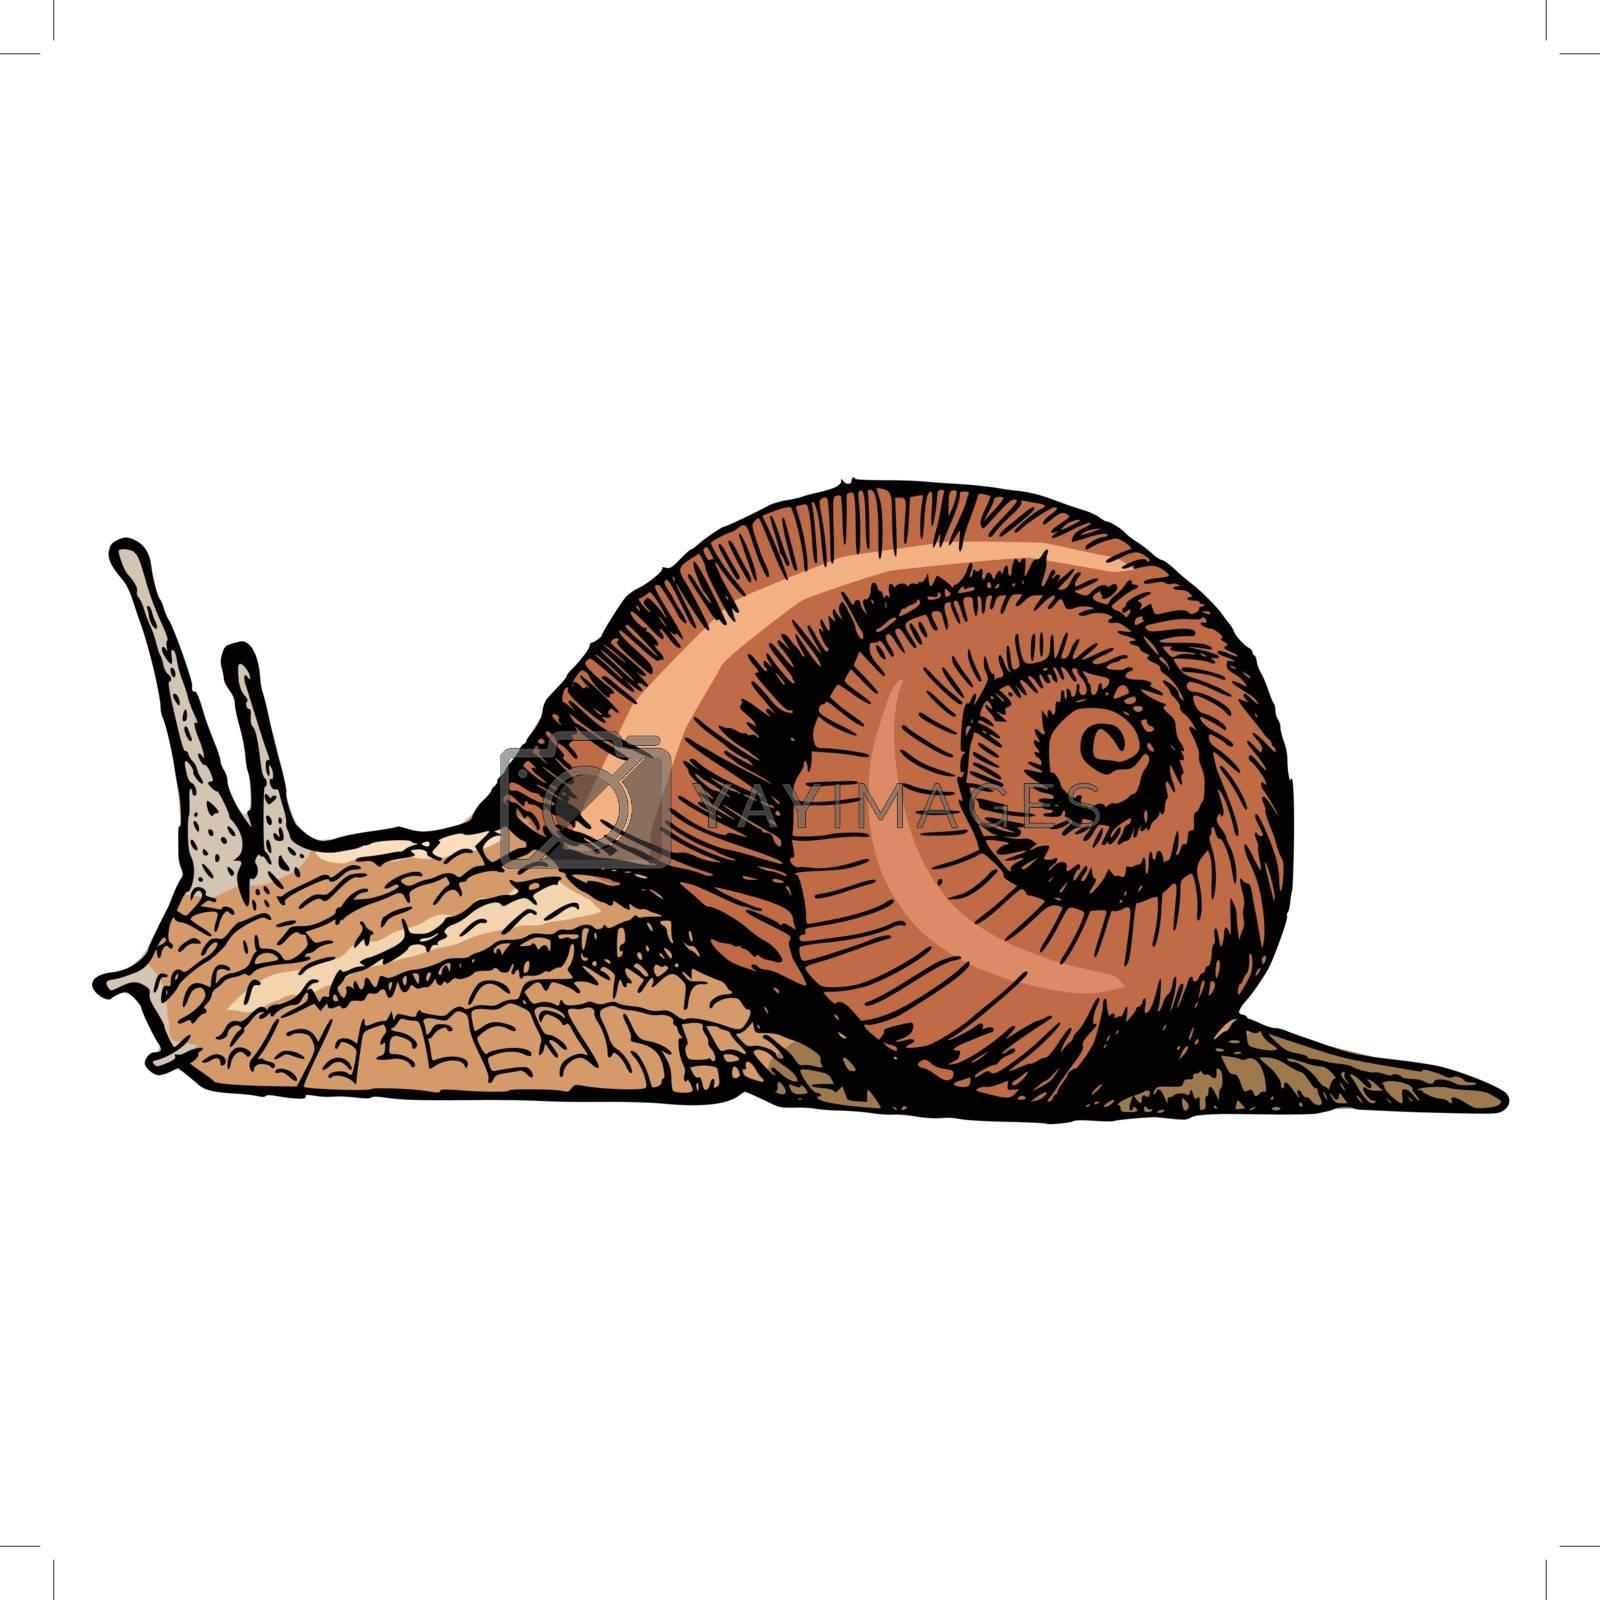 hand drawn, sketch, cartoon illustration of snail